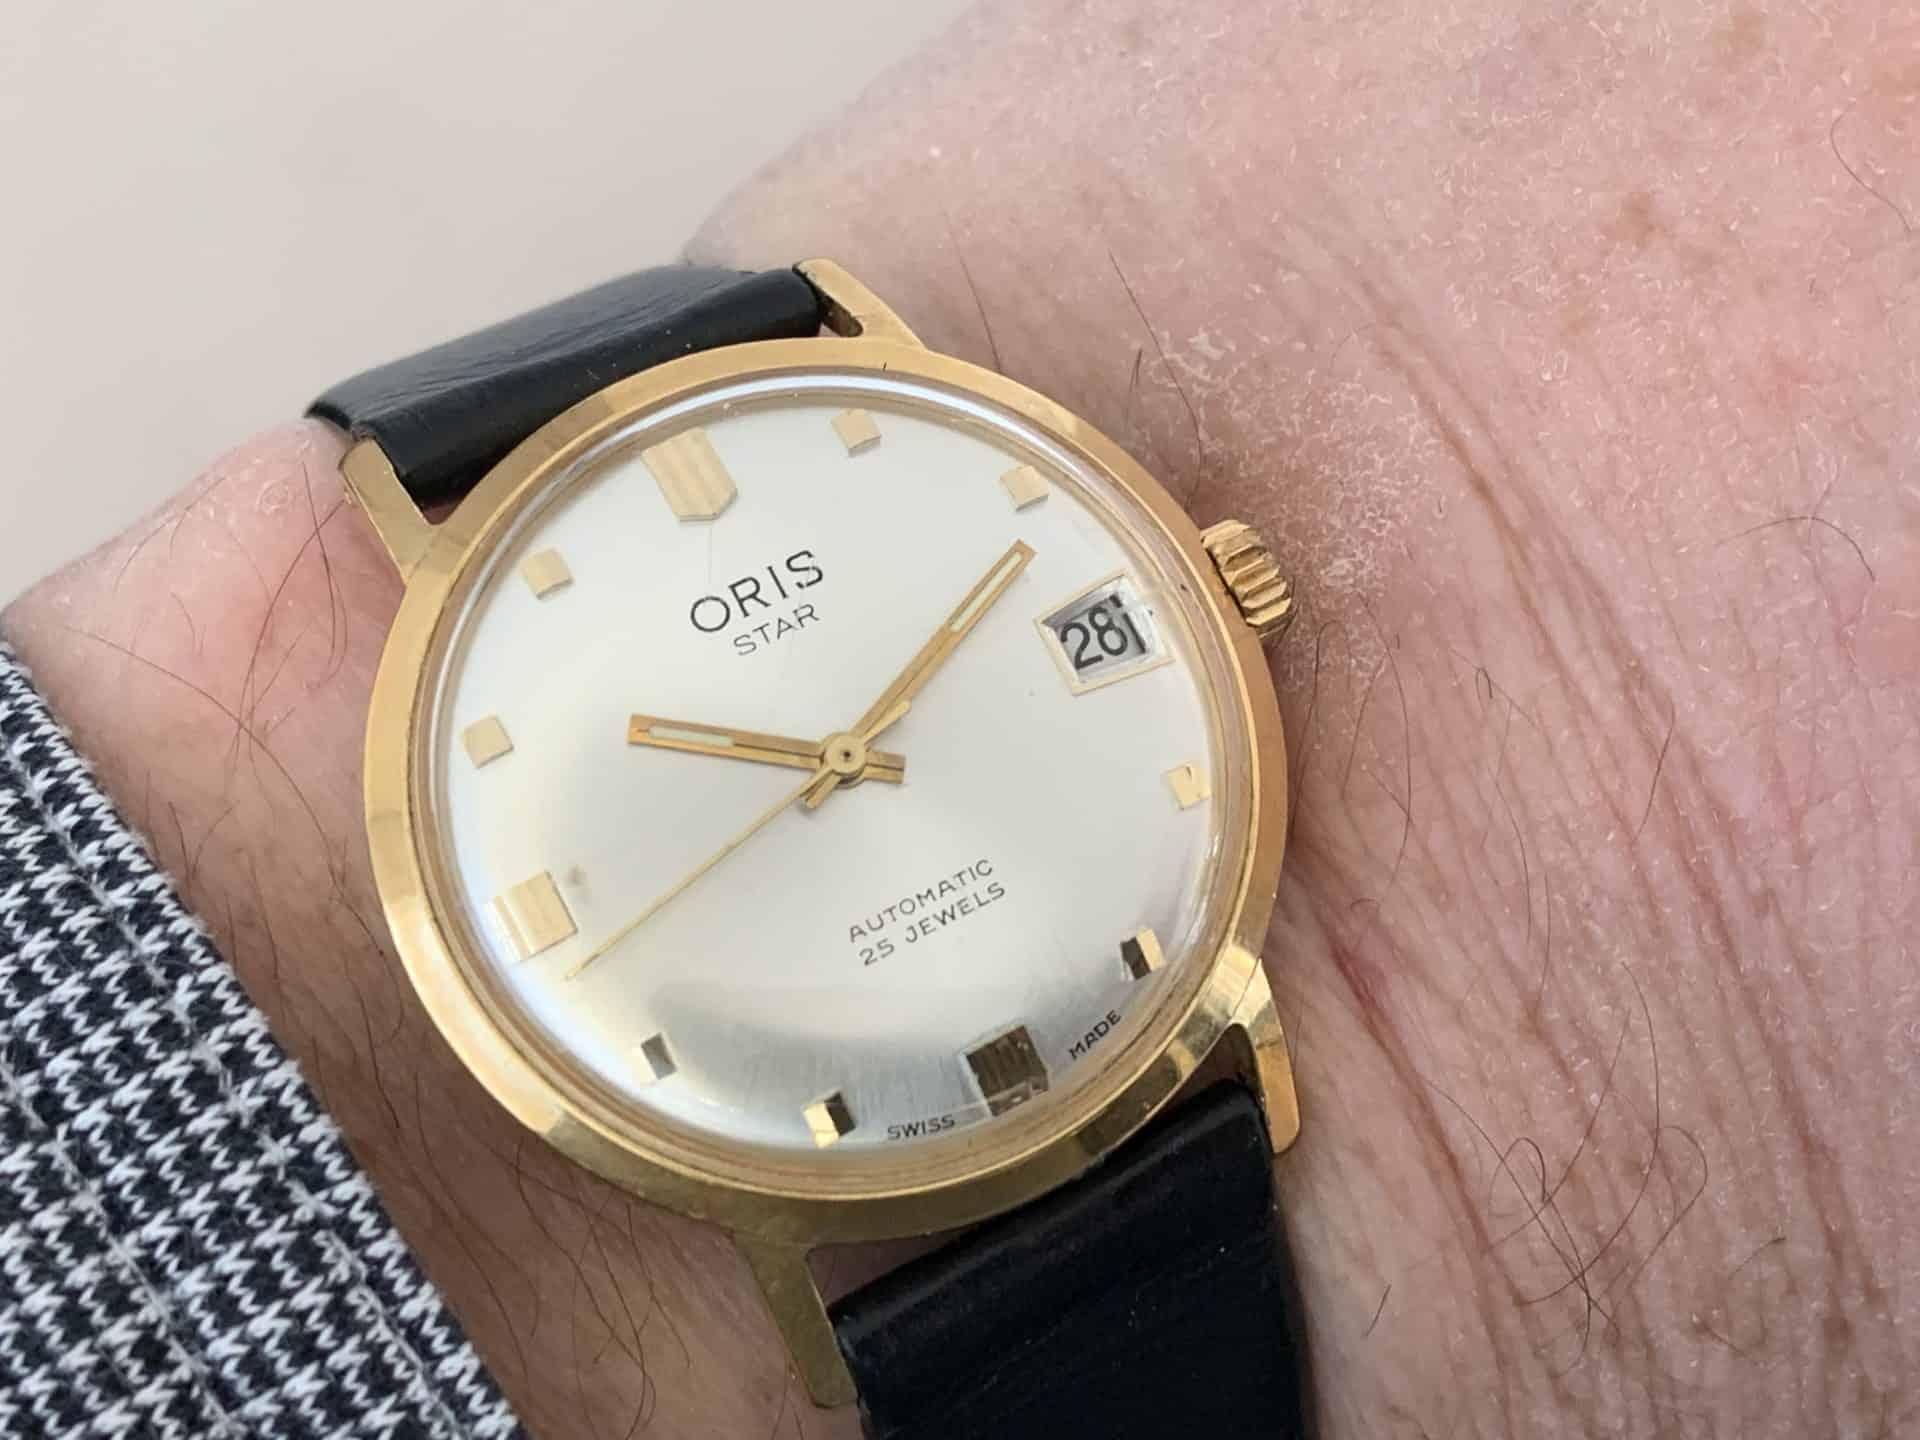 Die Armbanduhr Oris Star Automatik von ca. 1970 mit dem Kaliber 645